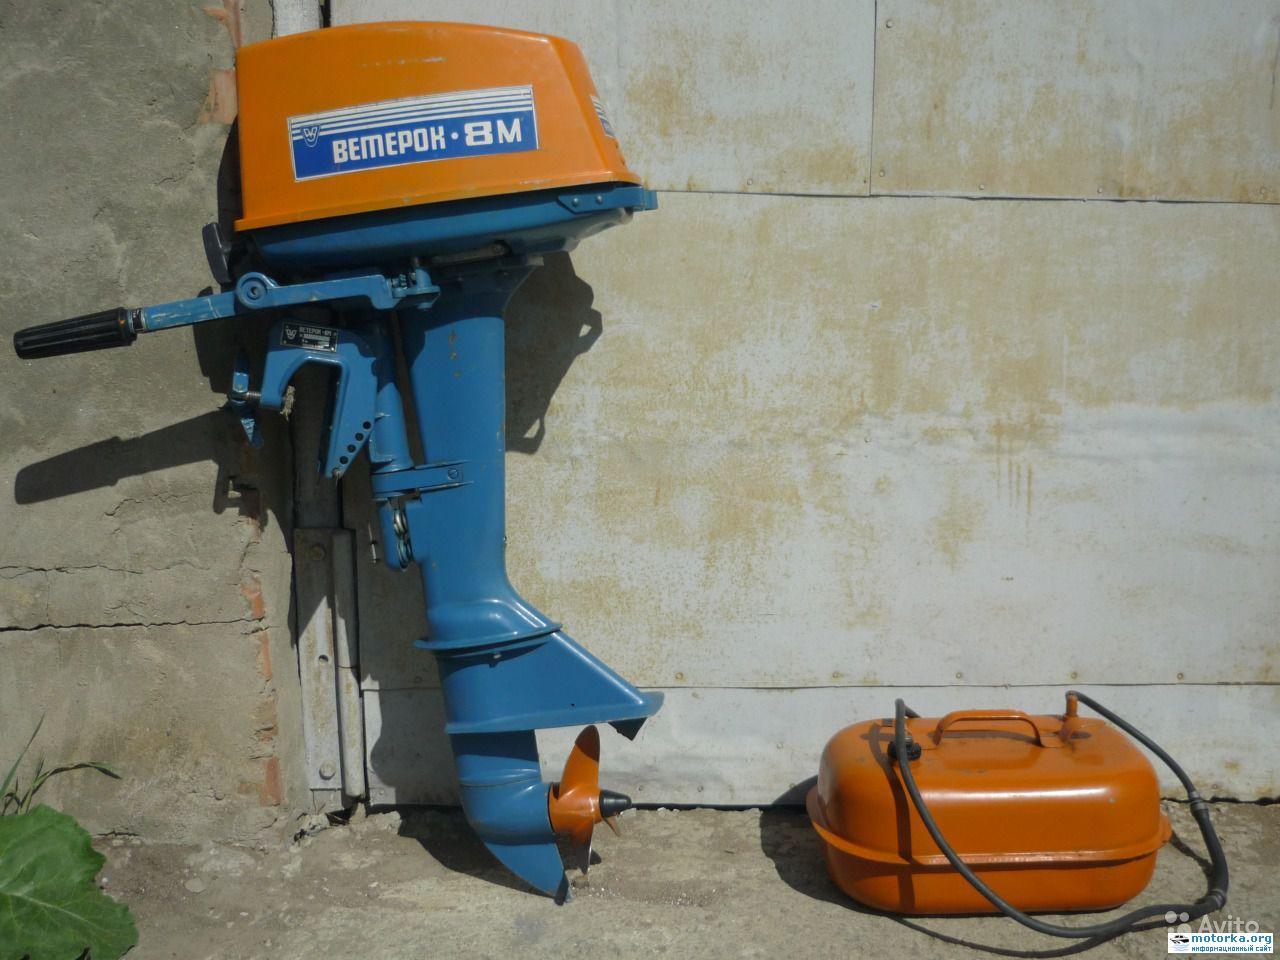 Ветерок-8М